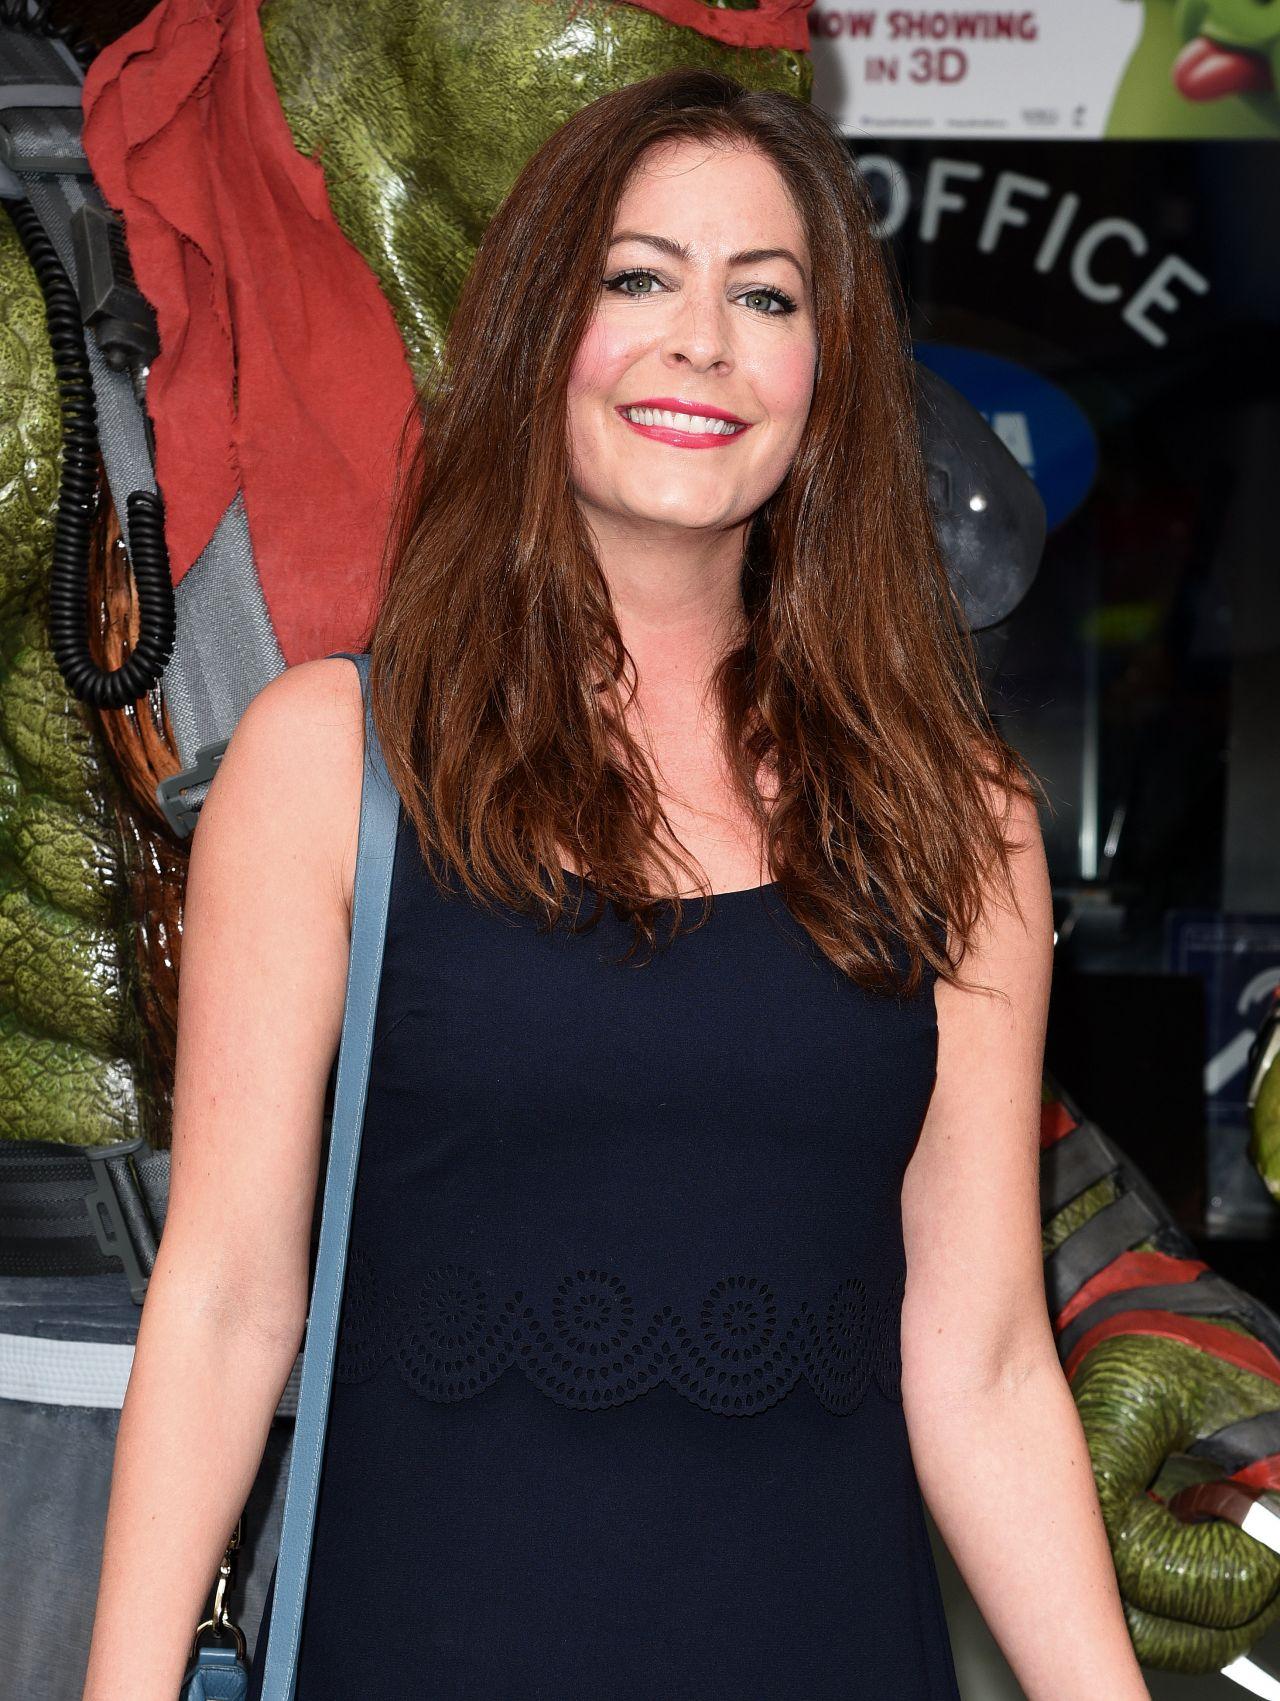 Lucy Horobin Teenage Mutant Ninja Turtles Vip Screening